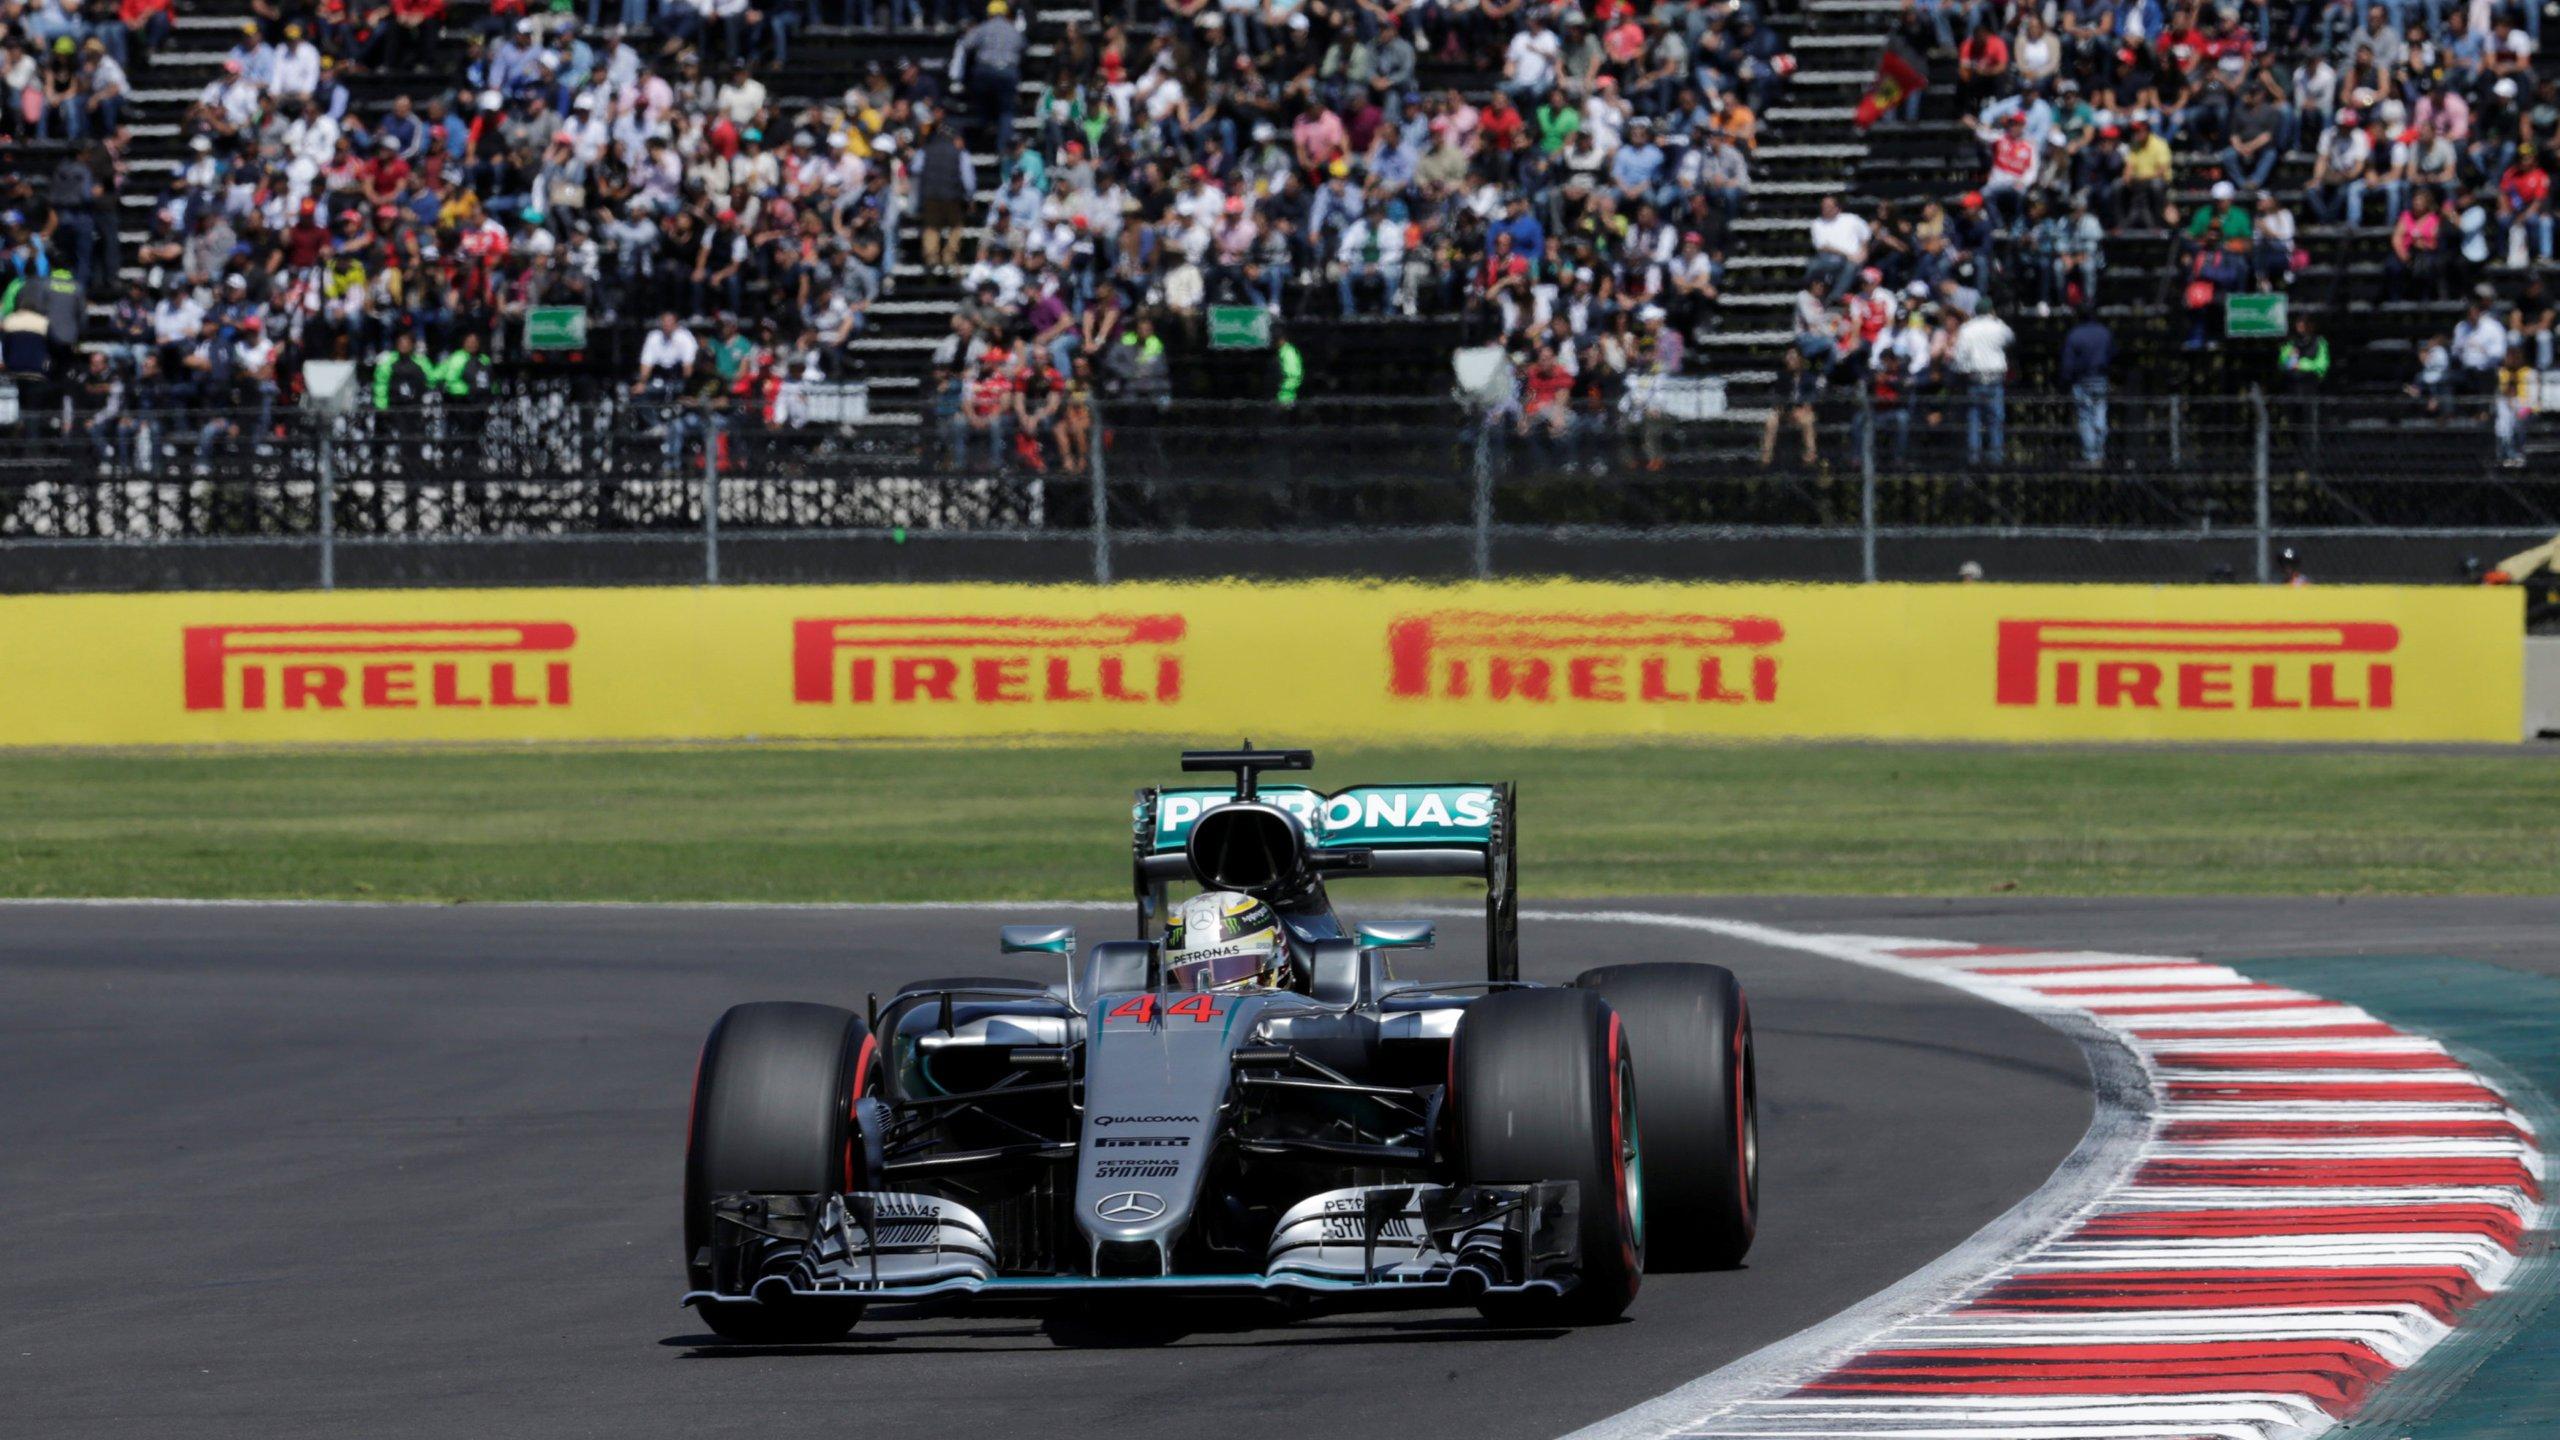 Mexican GP Lewis Hamilton HD wallpaper